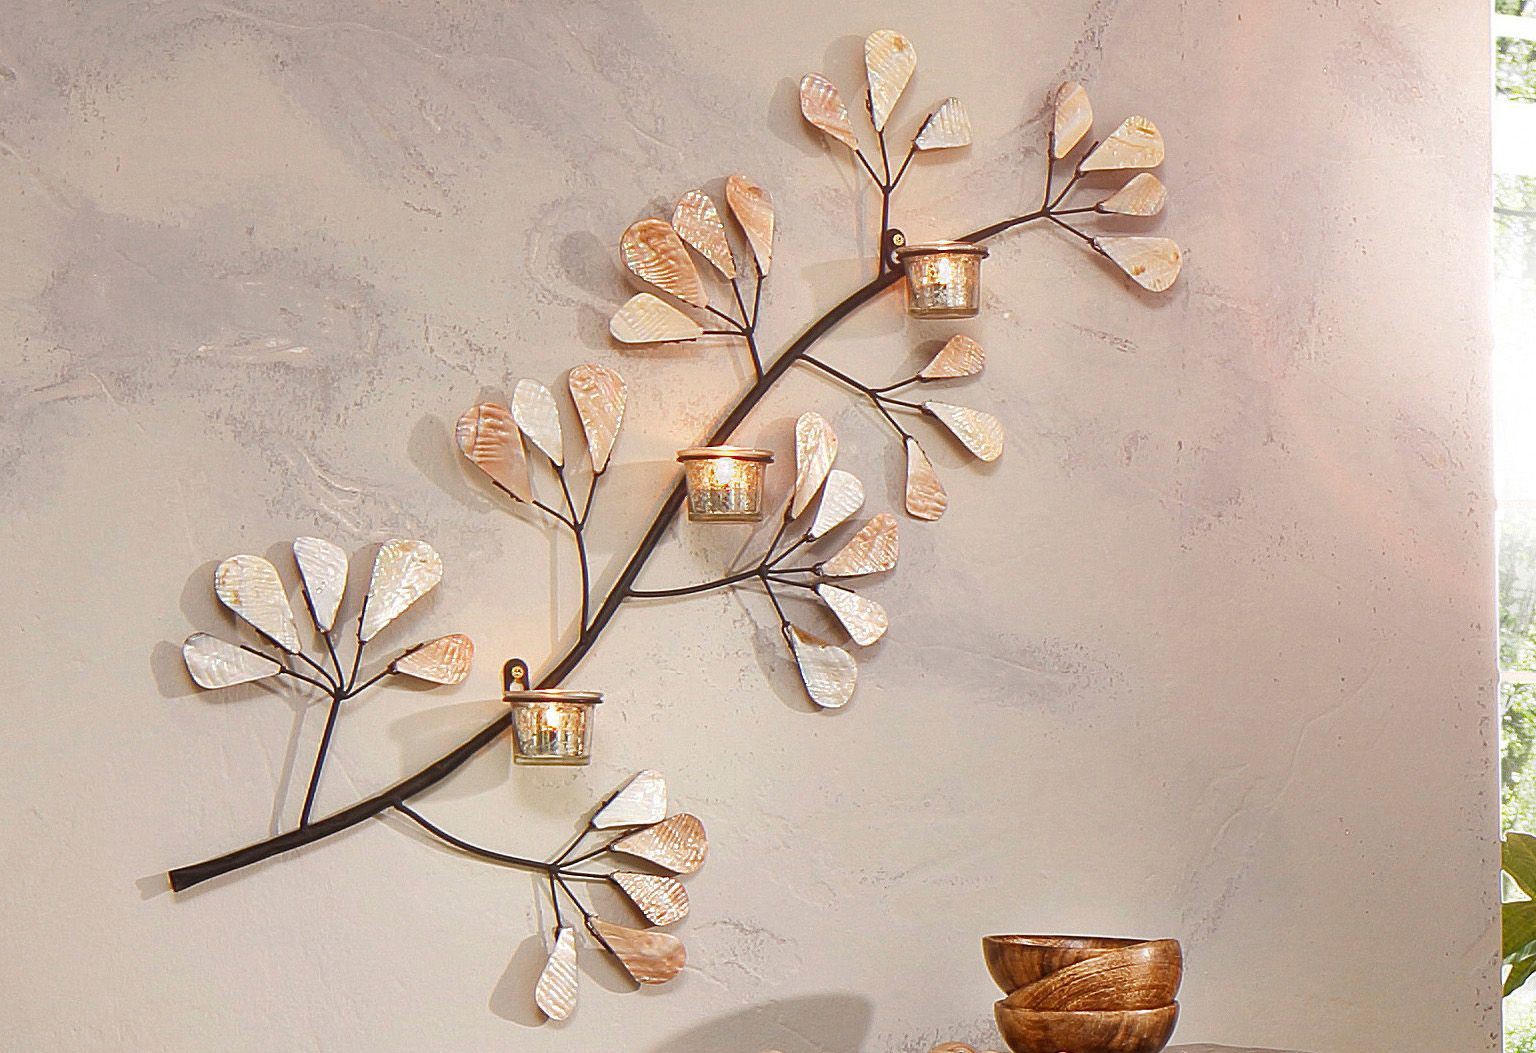 wanddekoration home affaire schwab versand. Black Bedroom Furniture Sets. Home Design Ideas